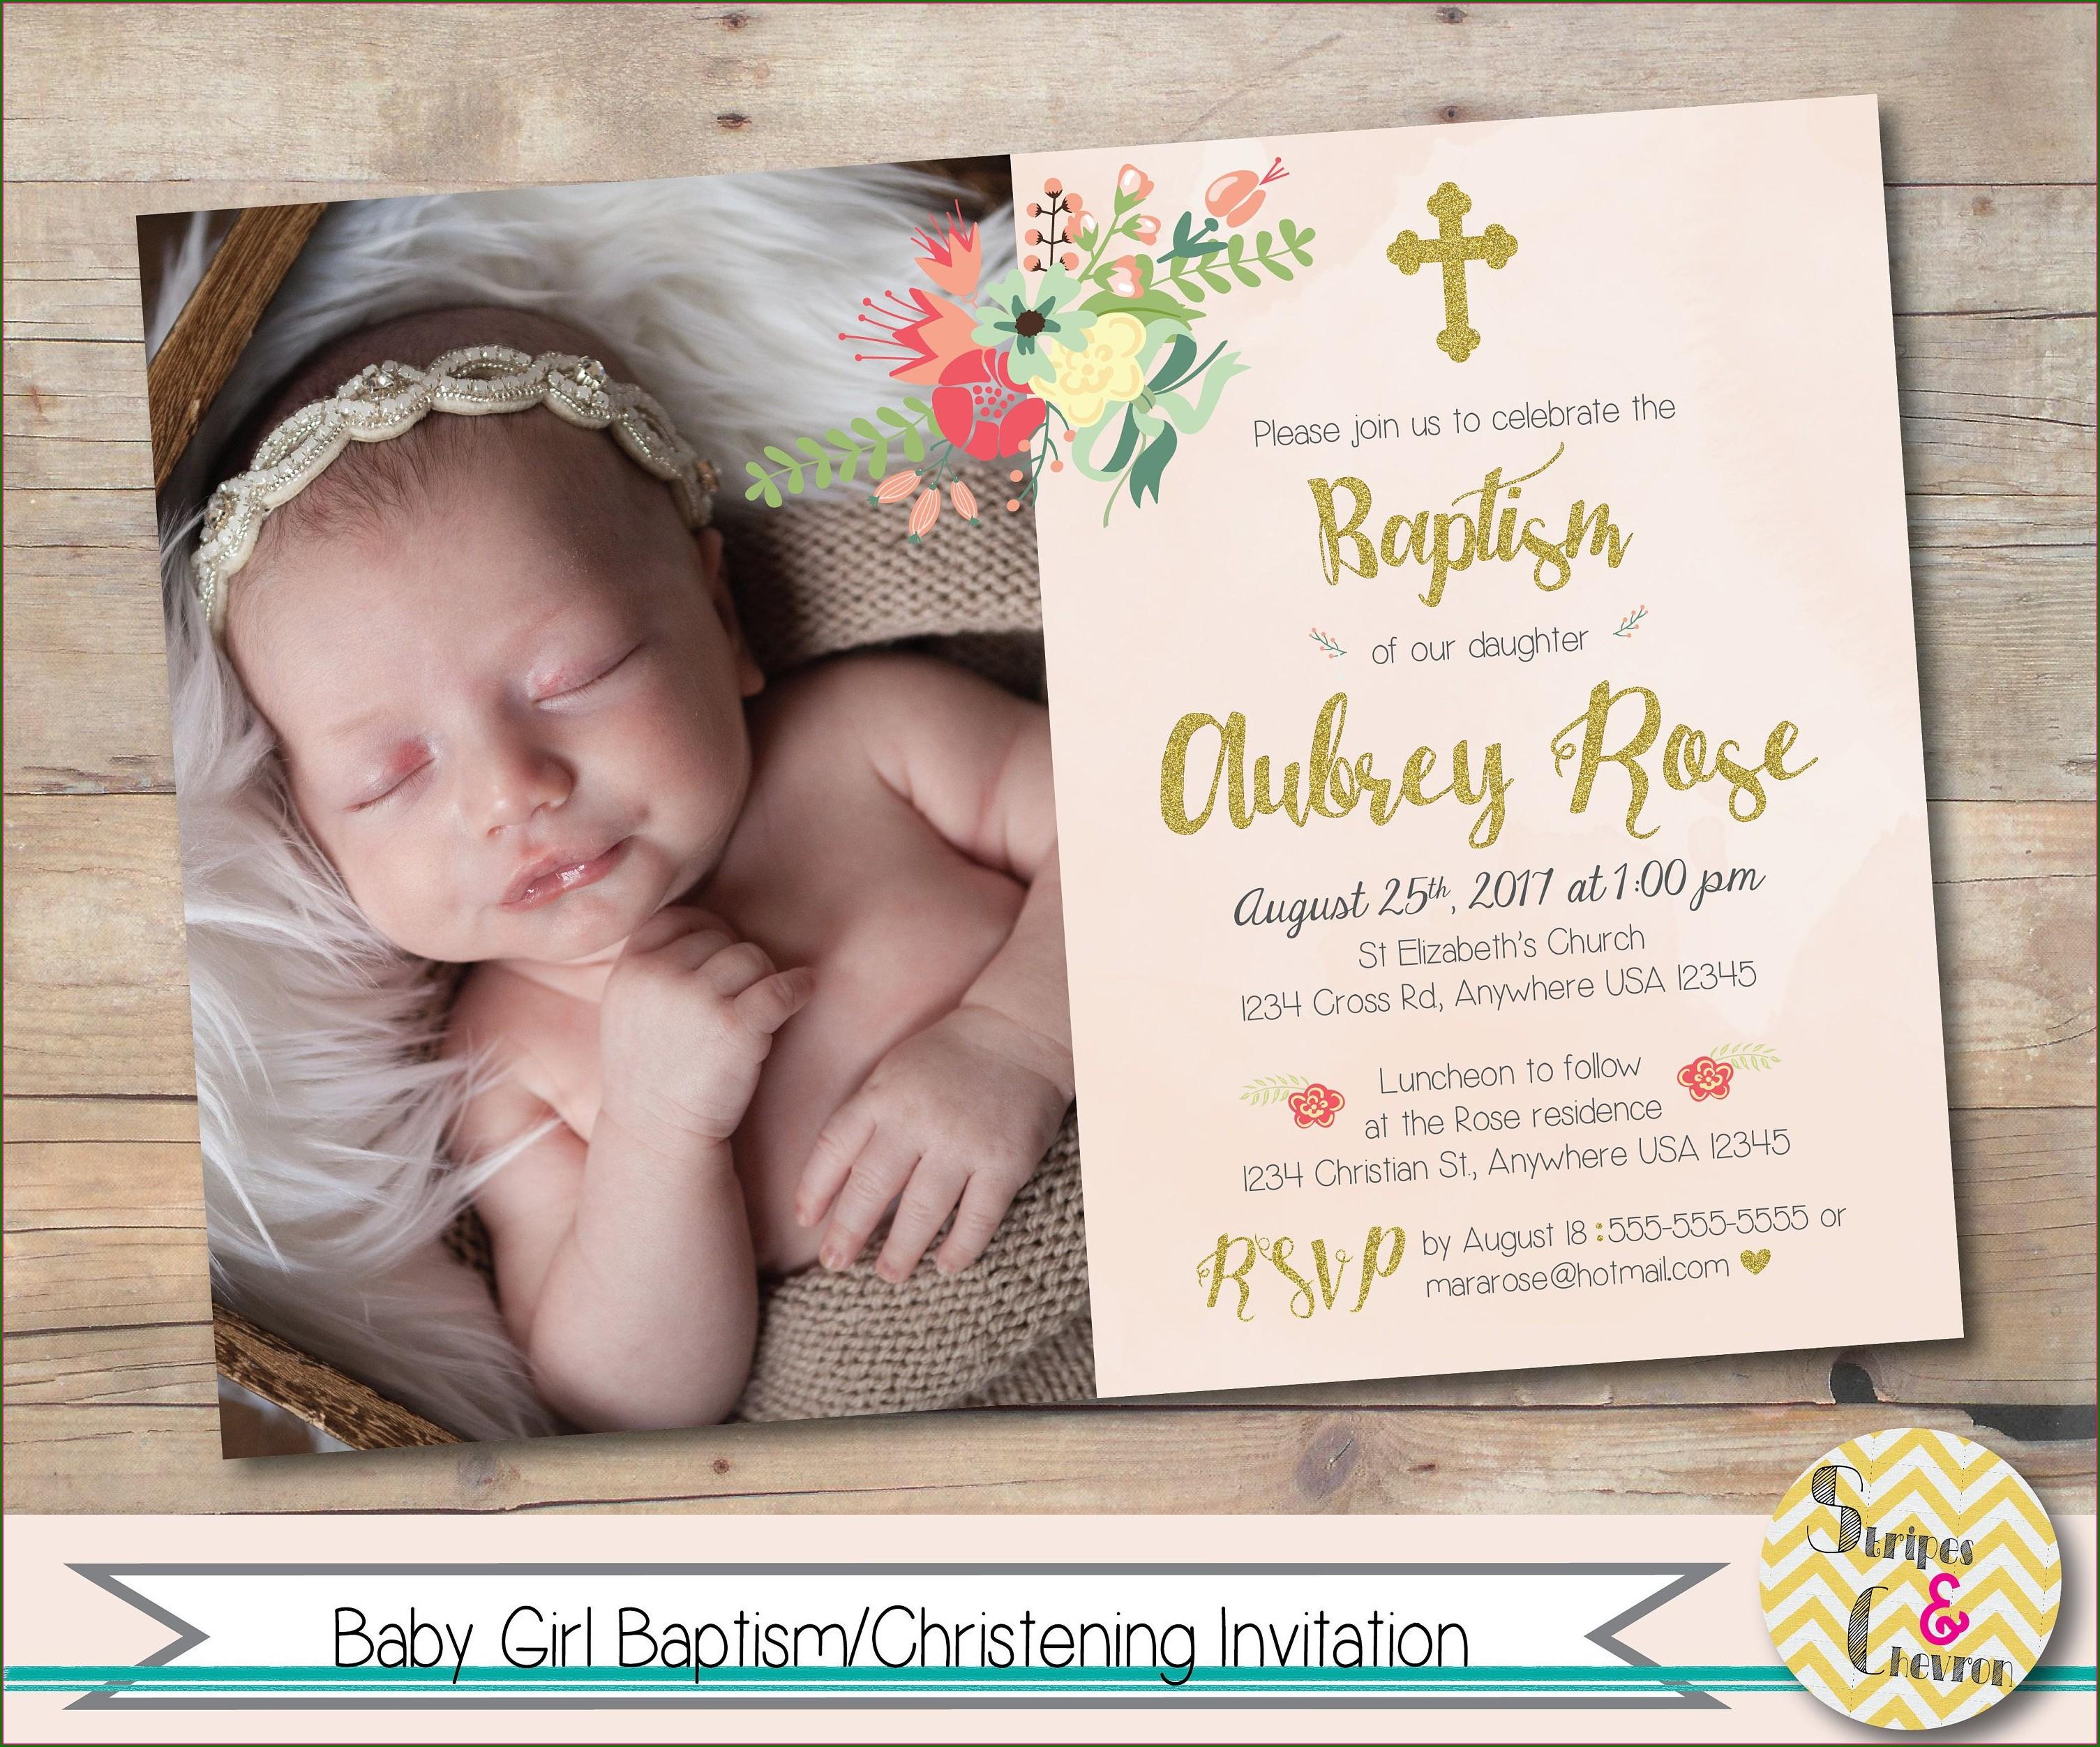 Editable Baptism Invitation For Baby Girl